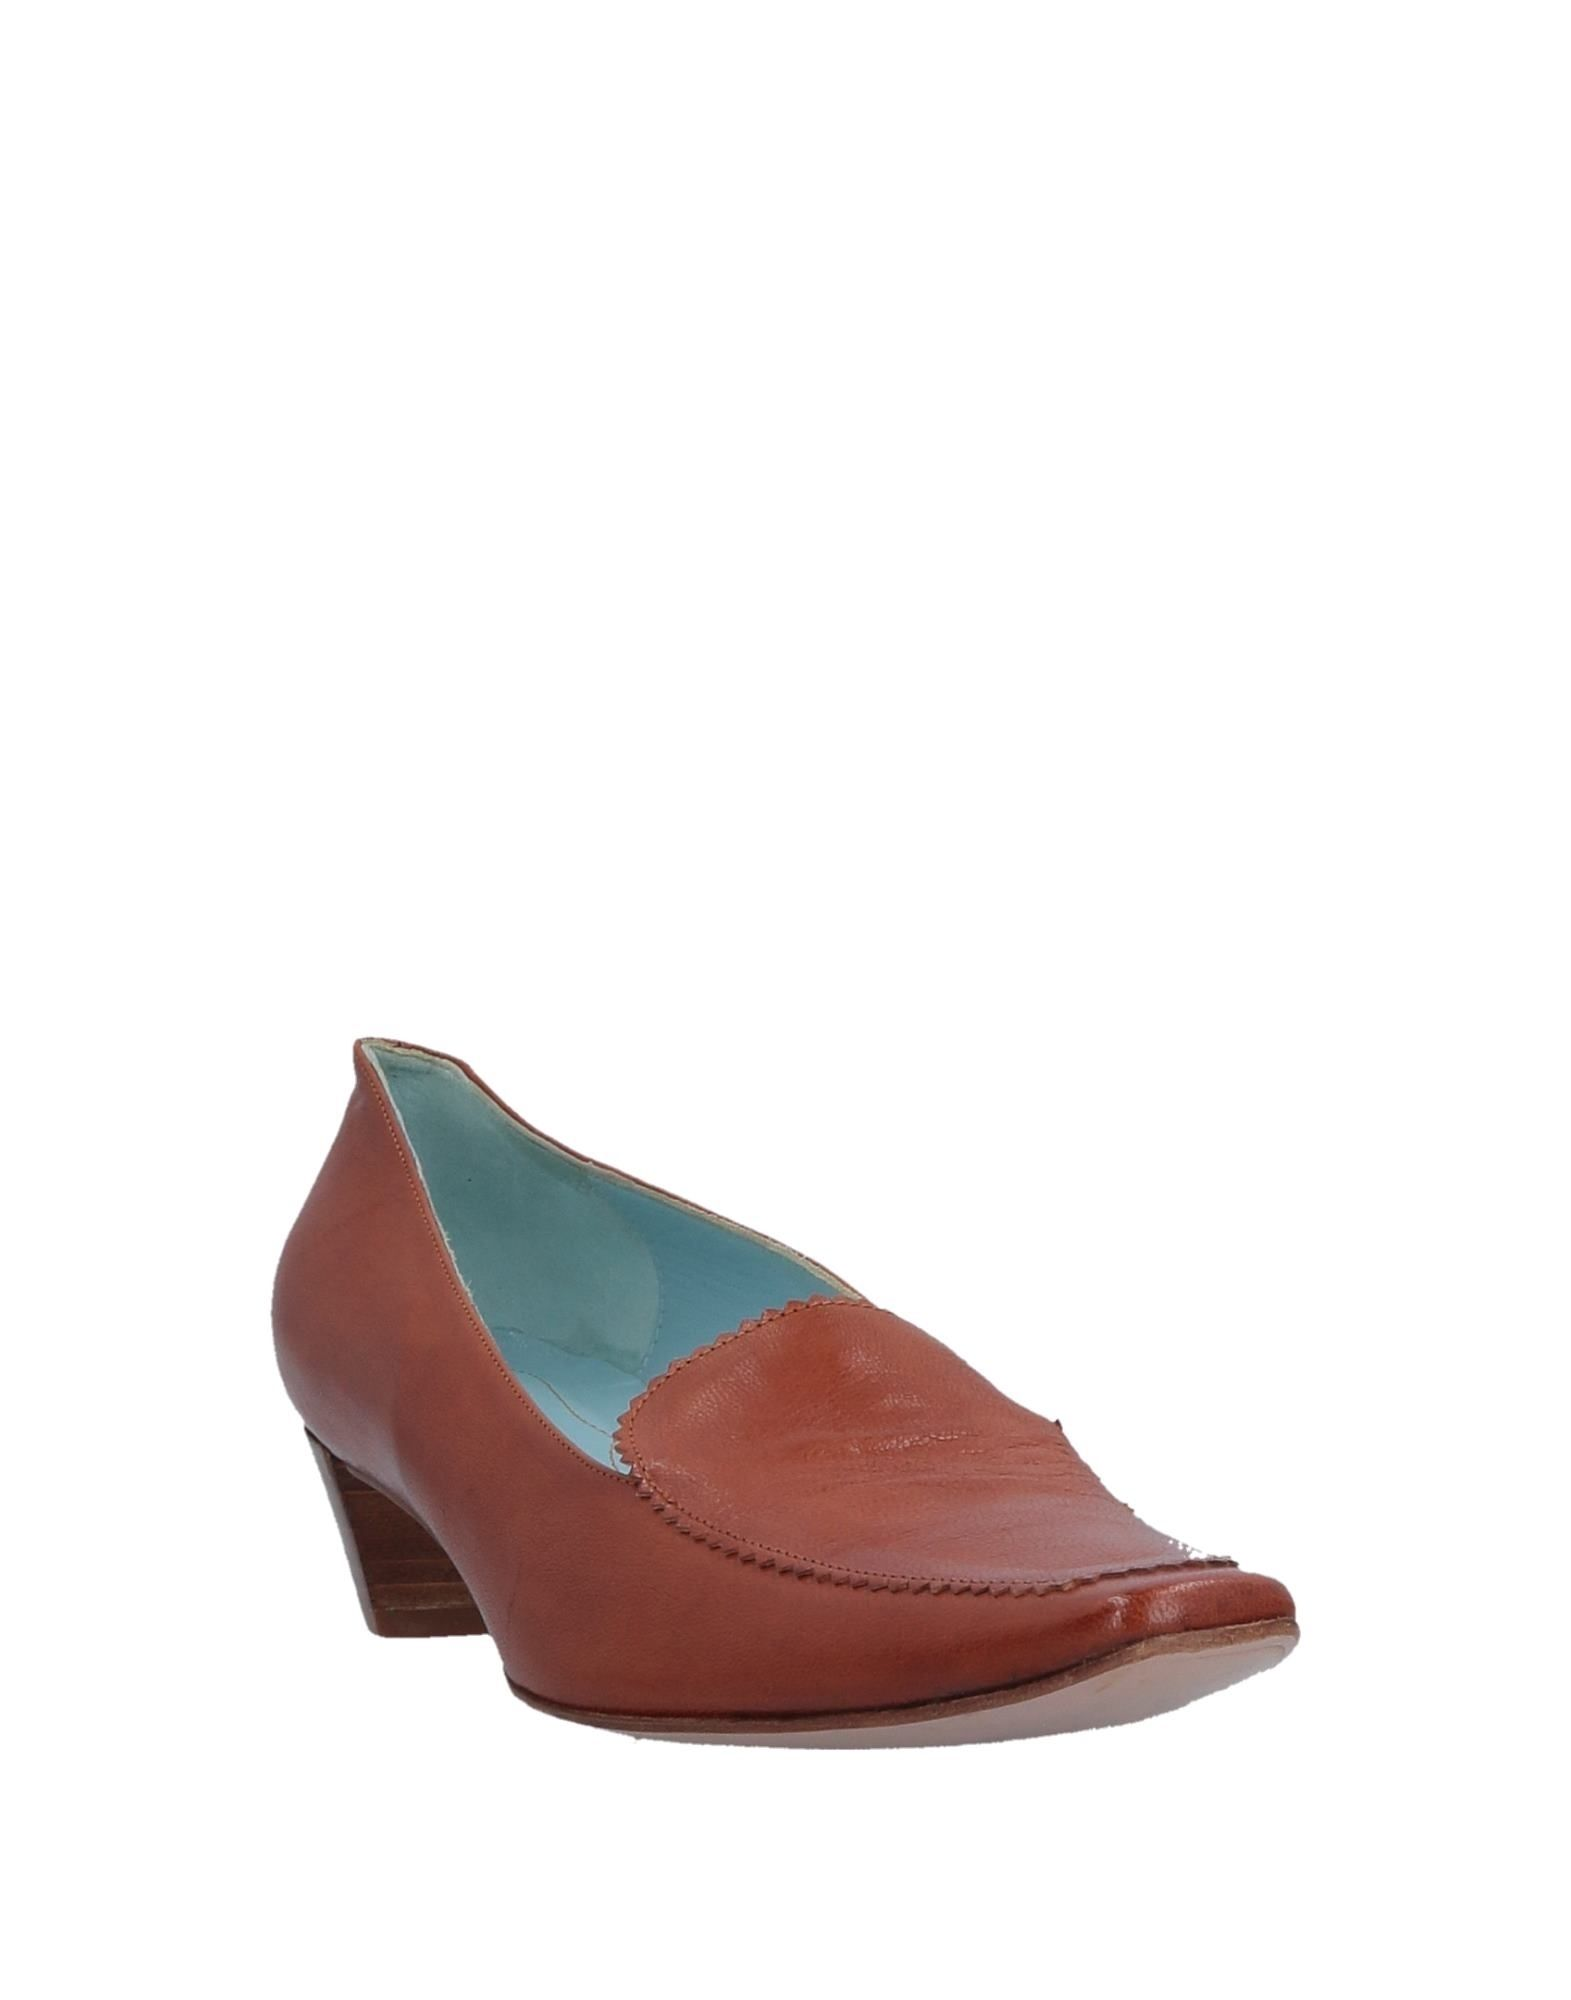 Moda Italia Mokassins Damen  11519348WI Gute Qualität beliebte Schuhe